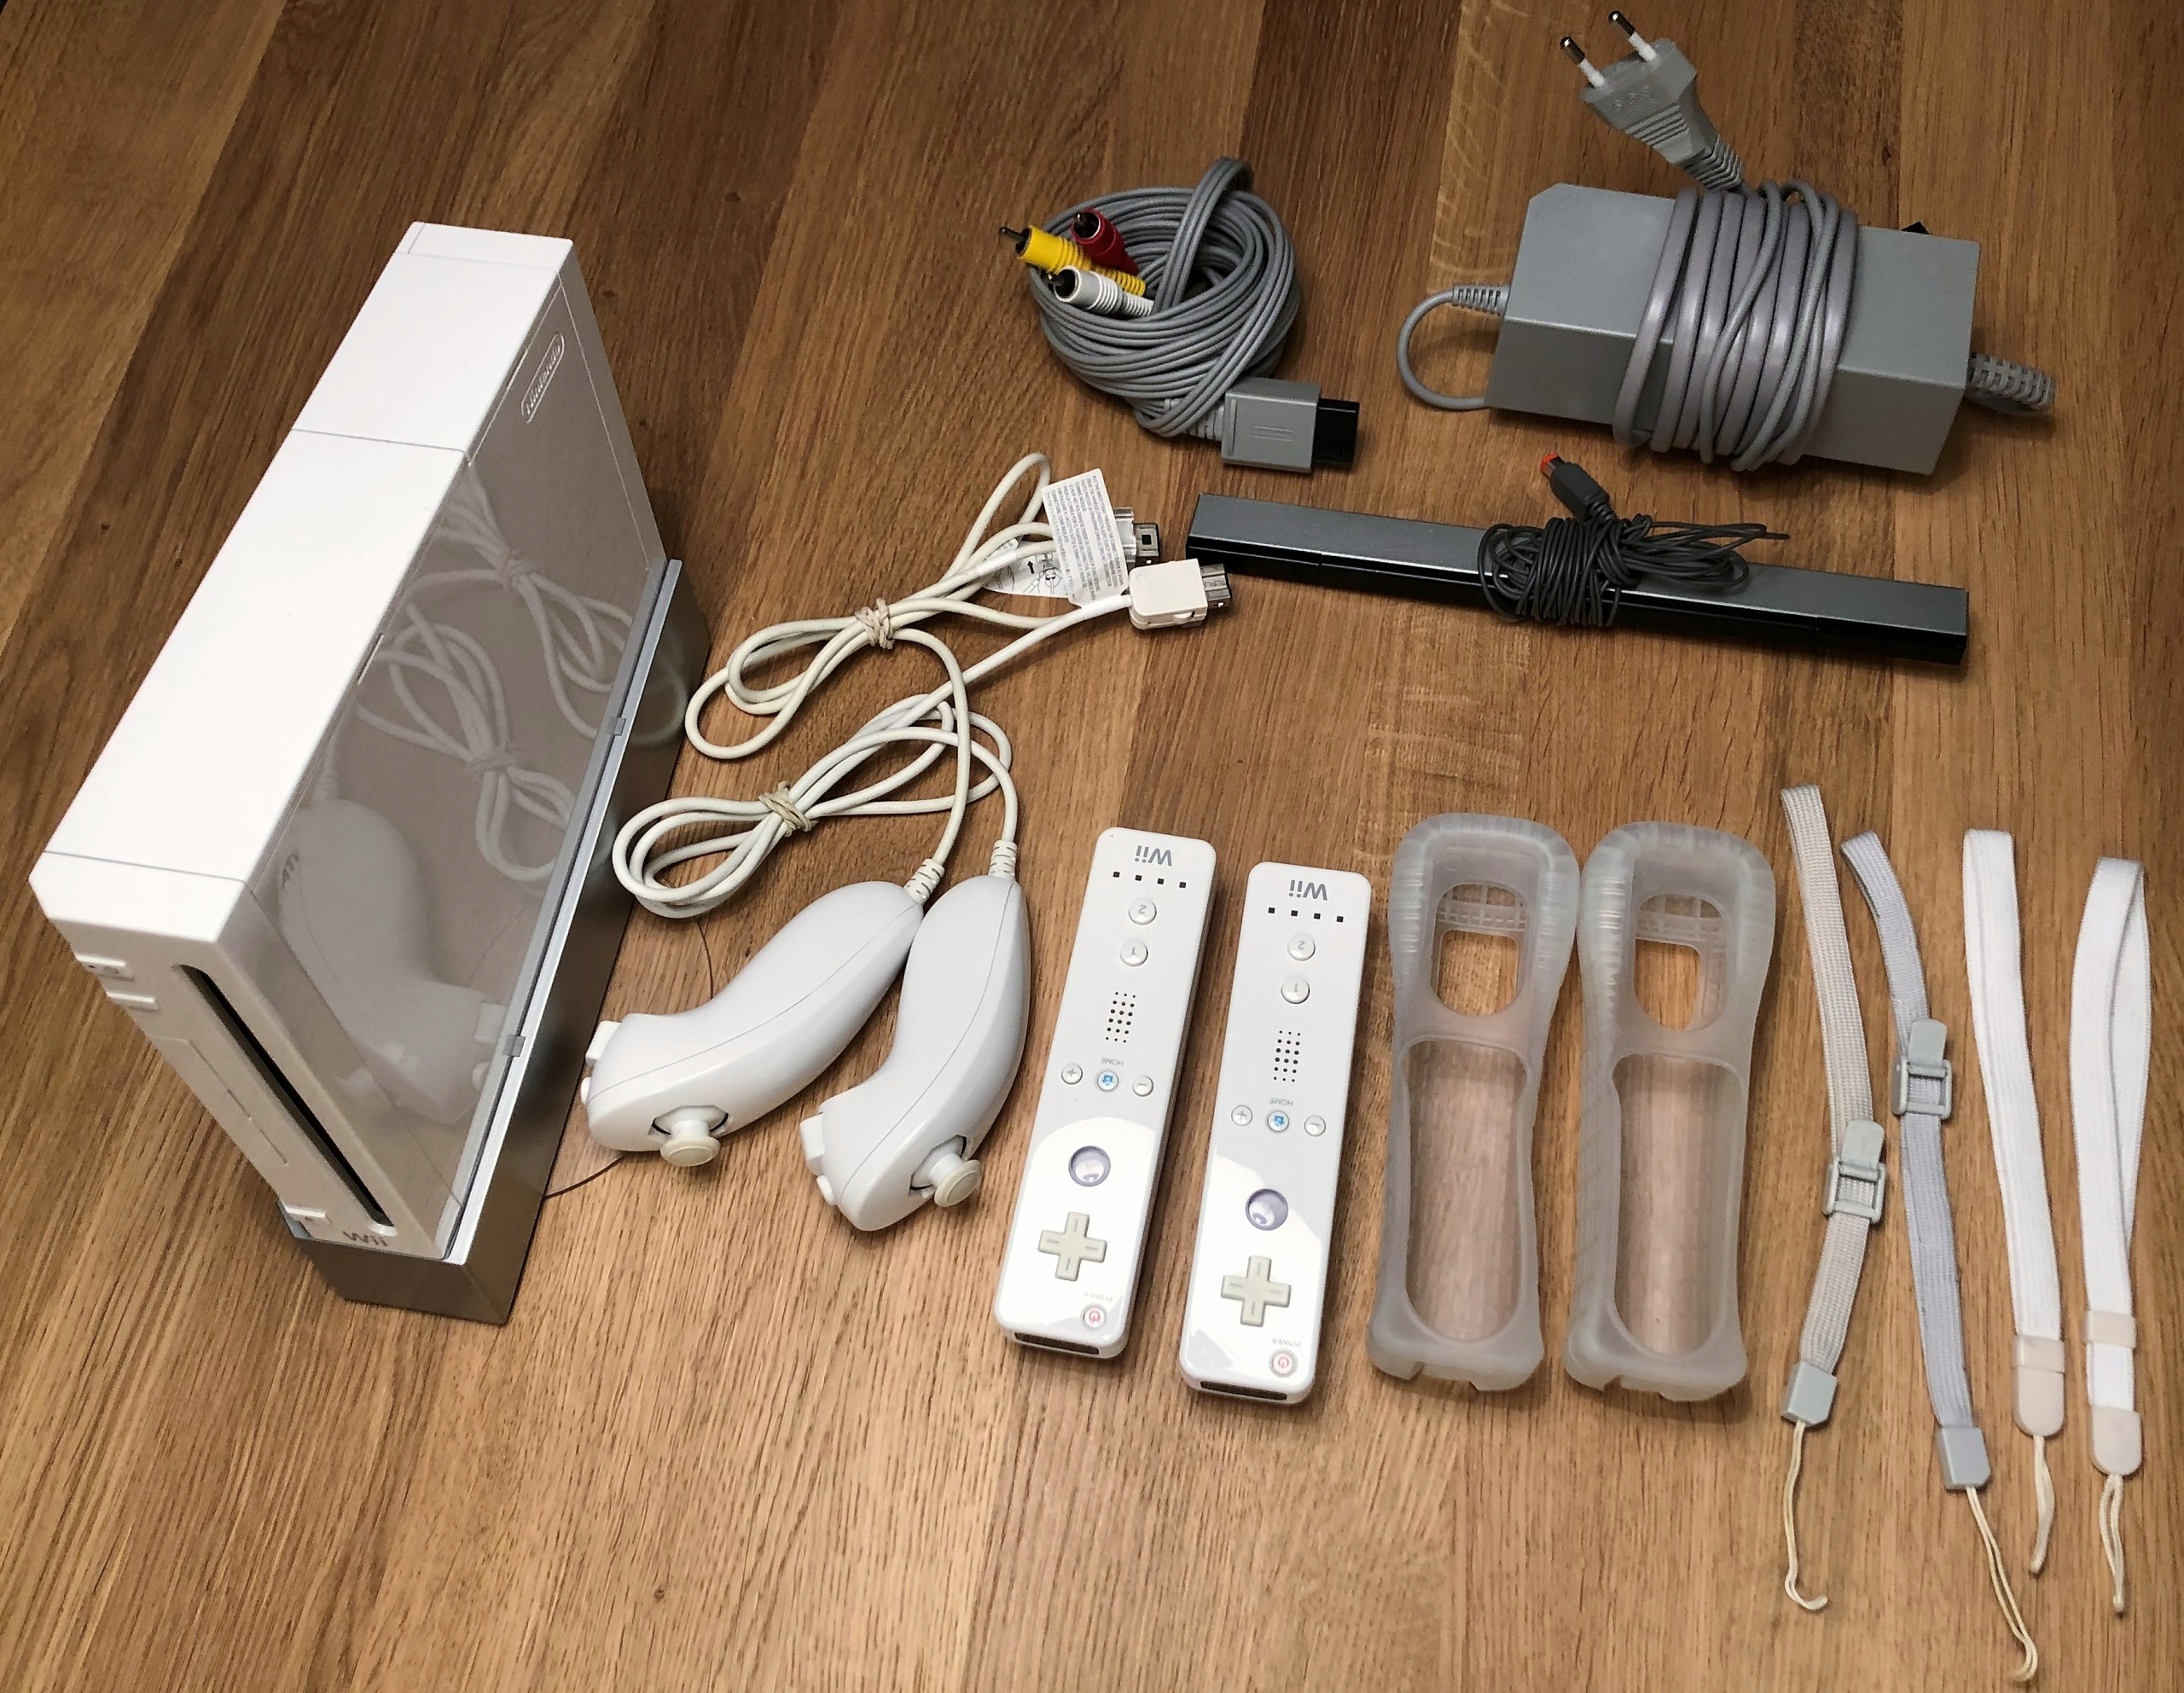 Konsola Wii + BalanceBoard+gry